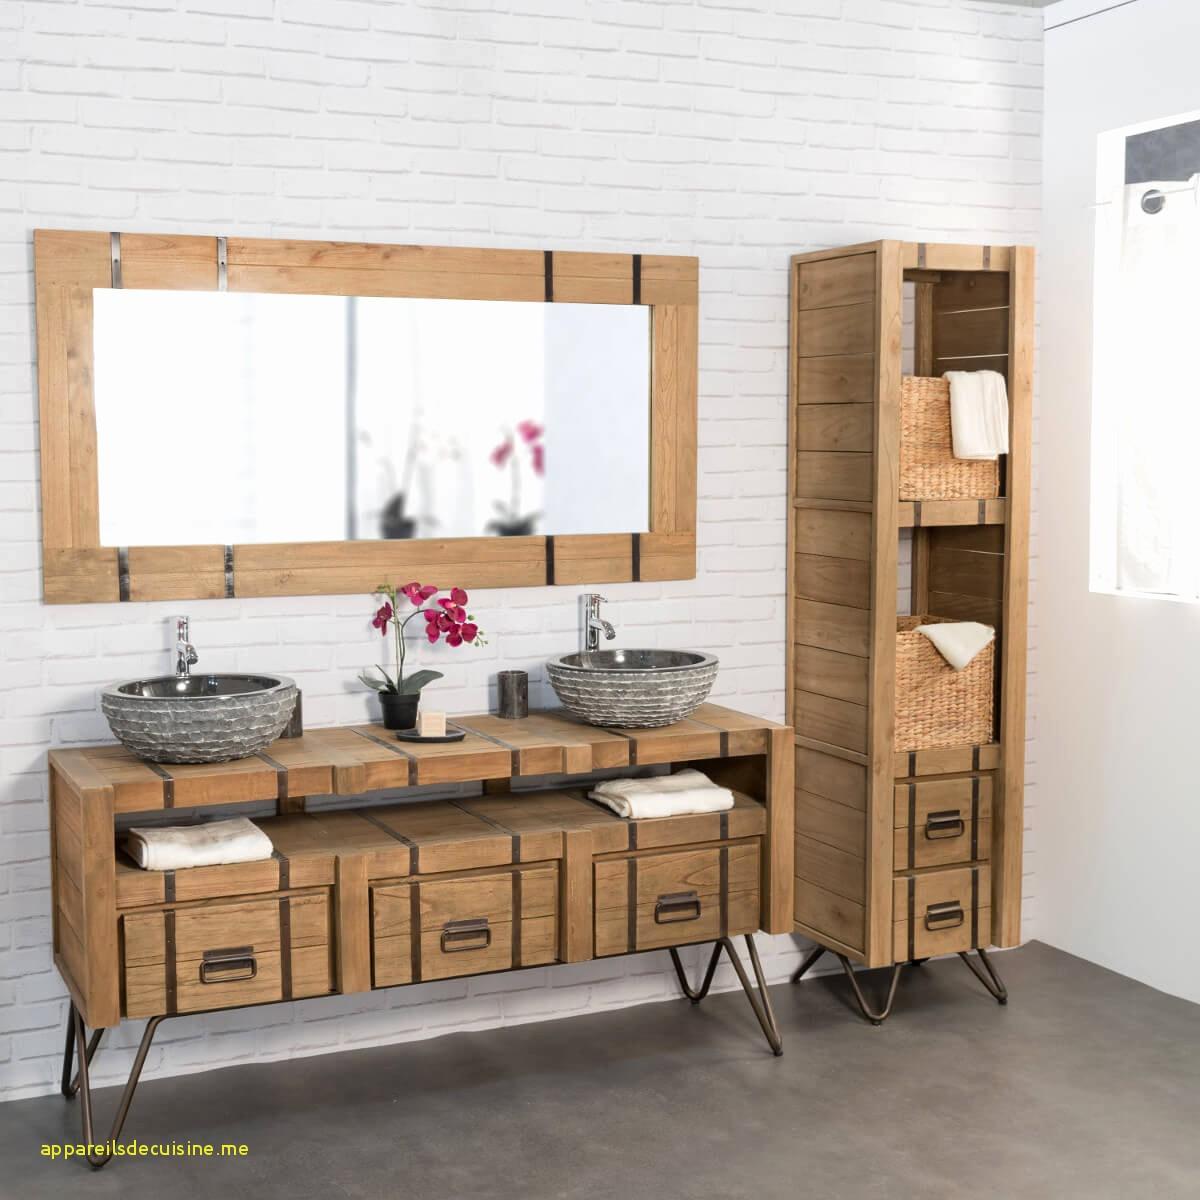 Plan De Travail Salle De Bain Ikea Beau Galerie Unique Meuble Salle De Bain Teck Ikea Artilysis